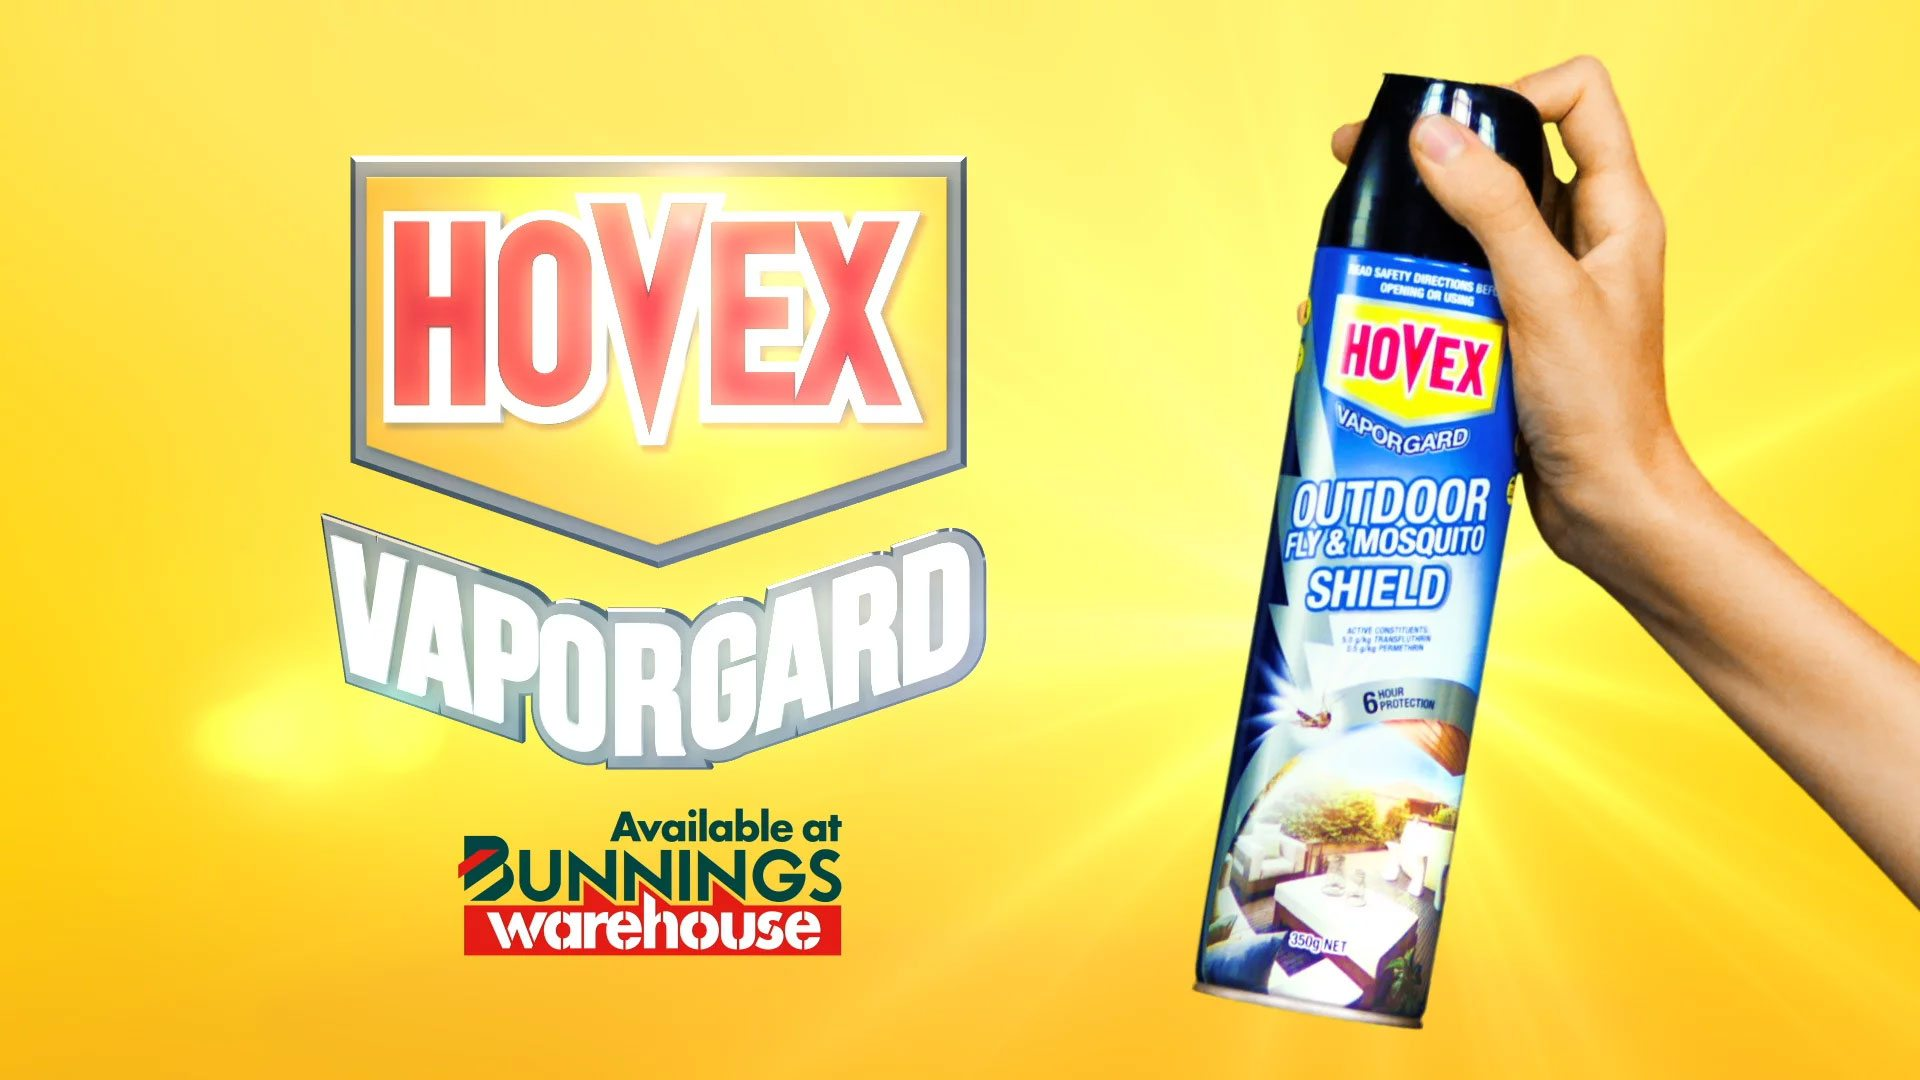 Hovex